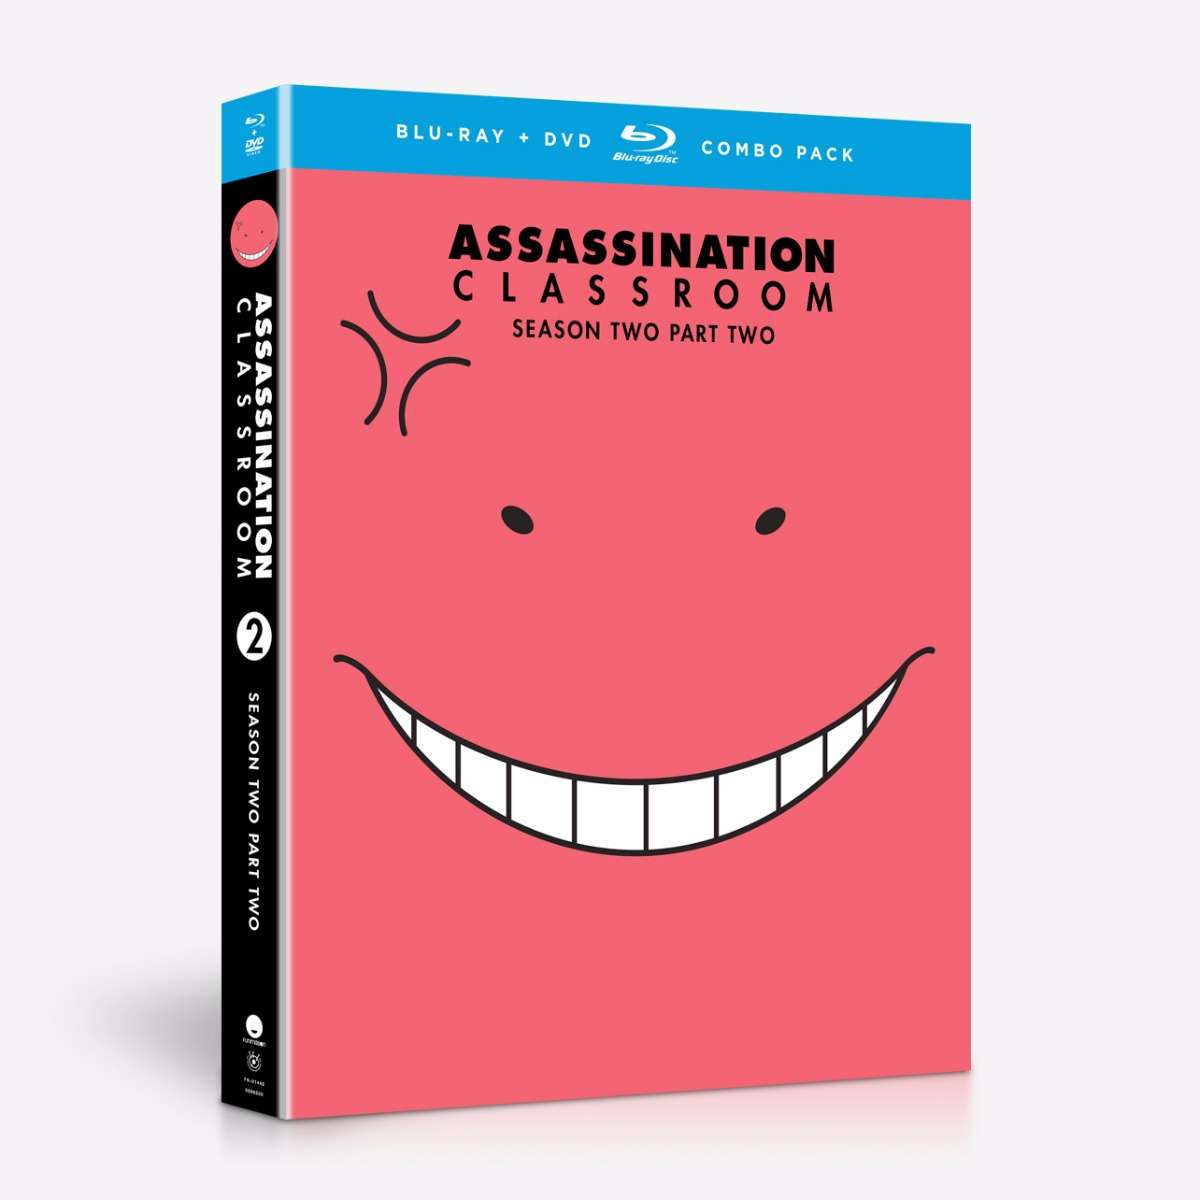 Assassination Classroom Season 2 Part 2 Blu-ray/DVD